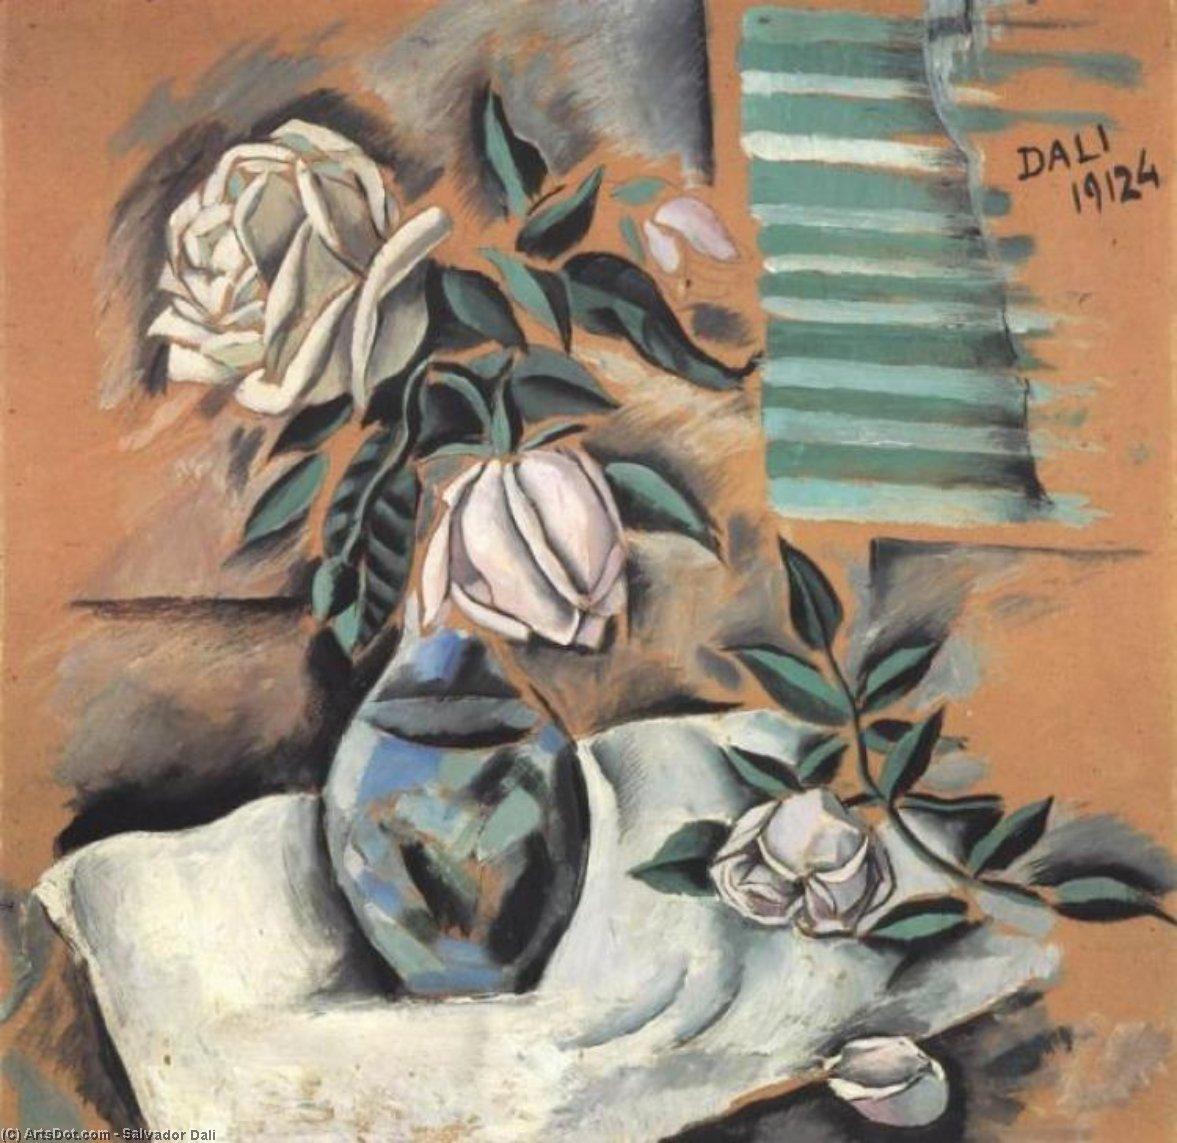 Wikioo.org - The Encyclopedia of Fine Arts - Painting, Artwork by Salvador Dali - Bouquet (L'Important c'est la Rose)